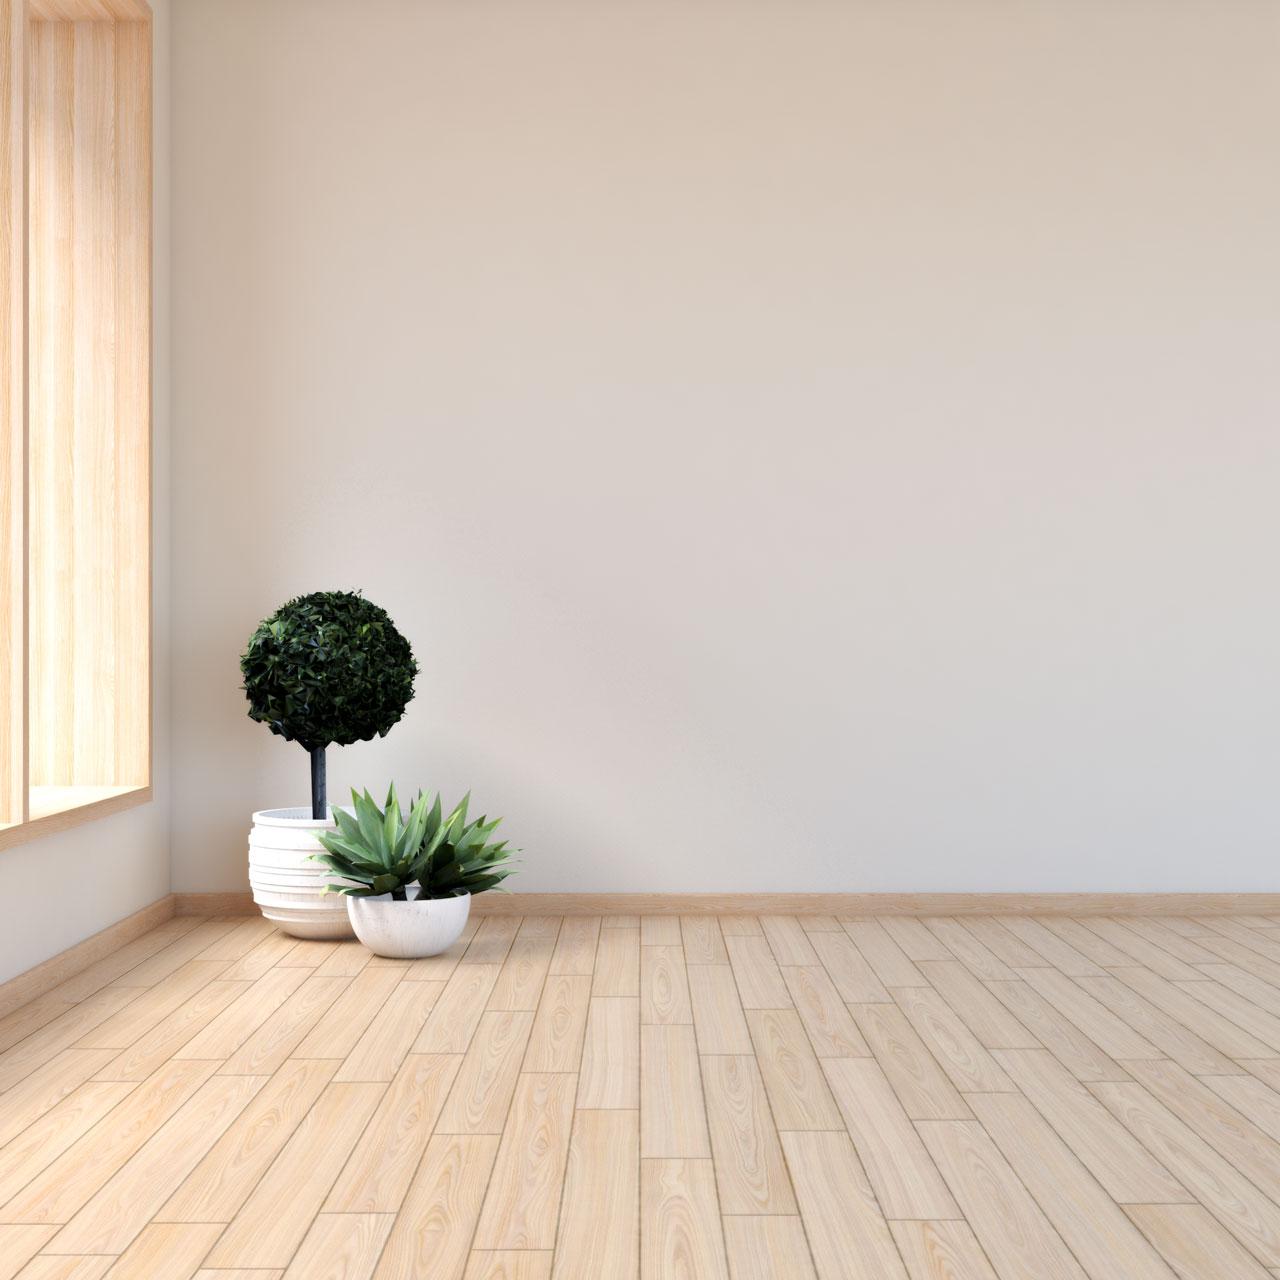 Natural tan walls with light wood flooring